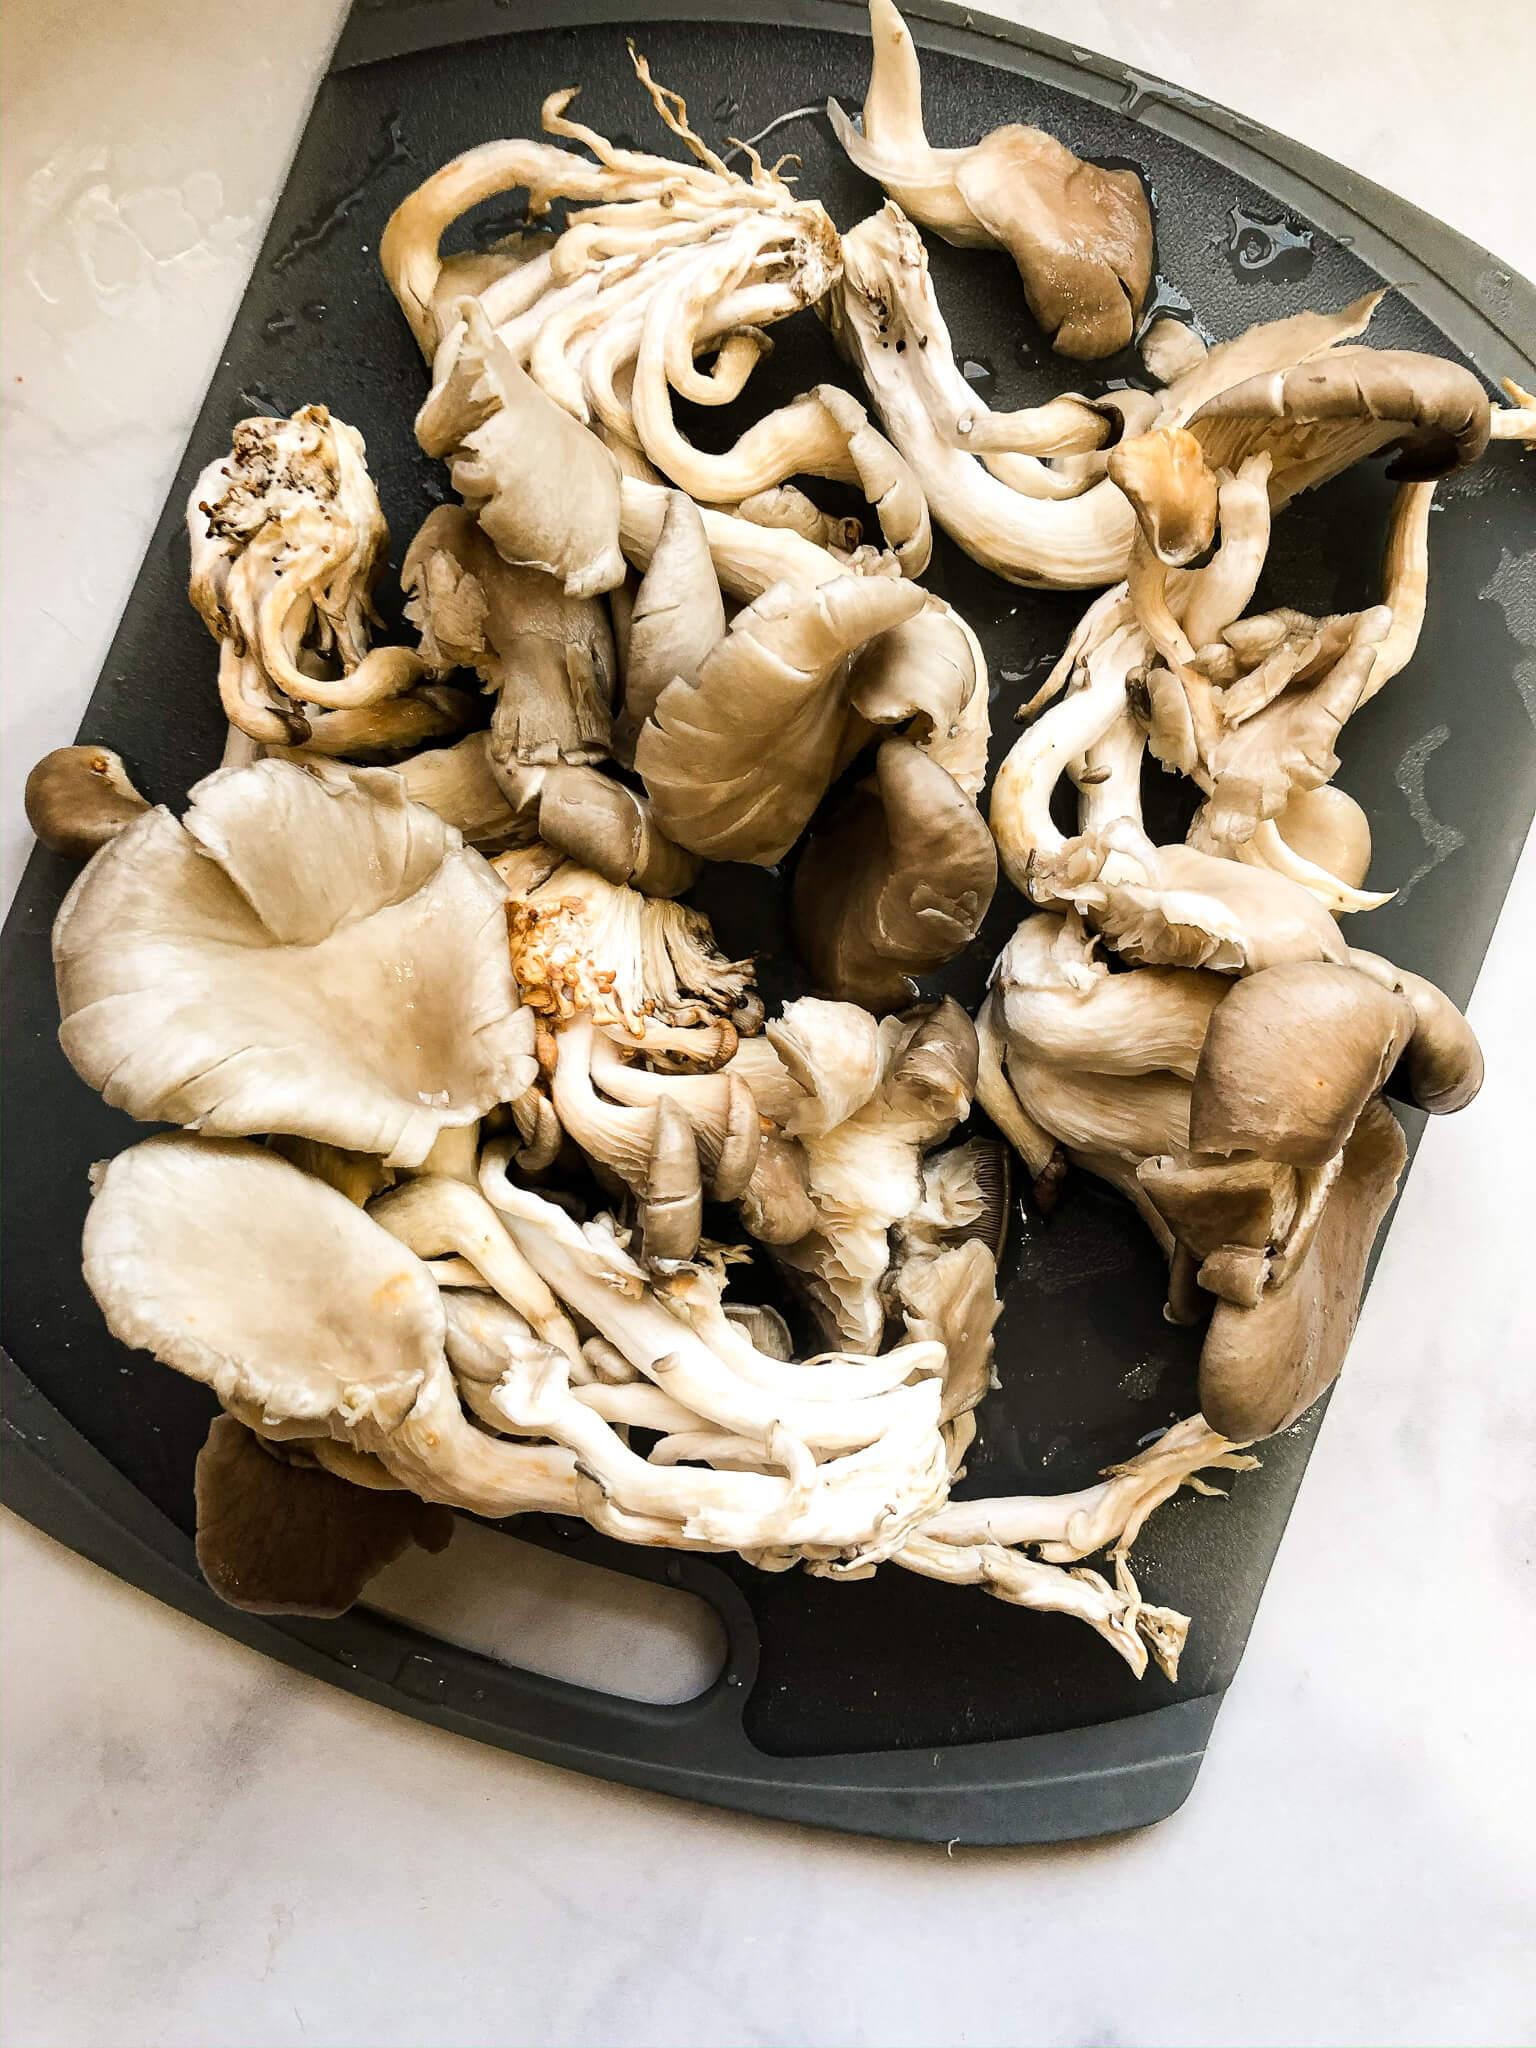 Oyster Mushrooms on Gray Cutting Board